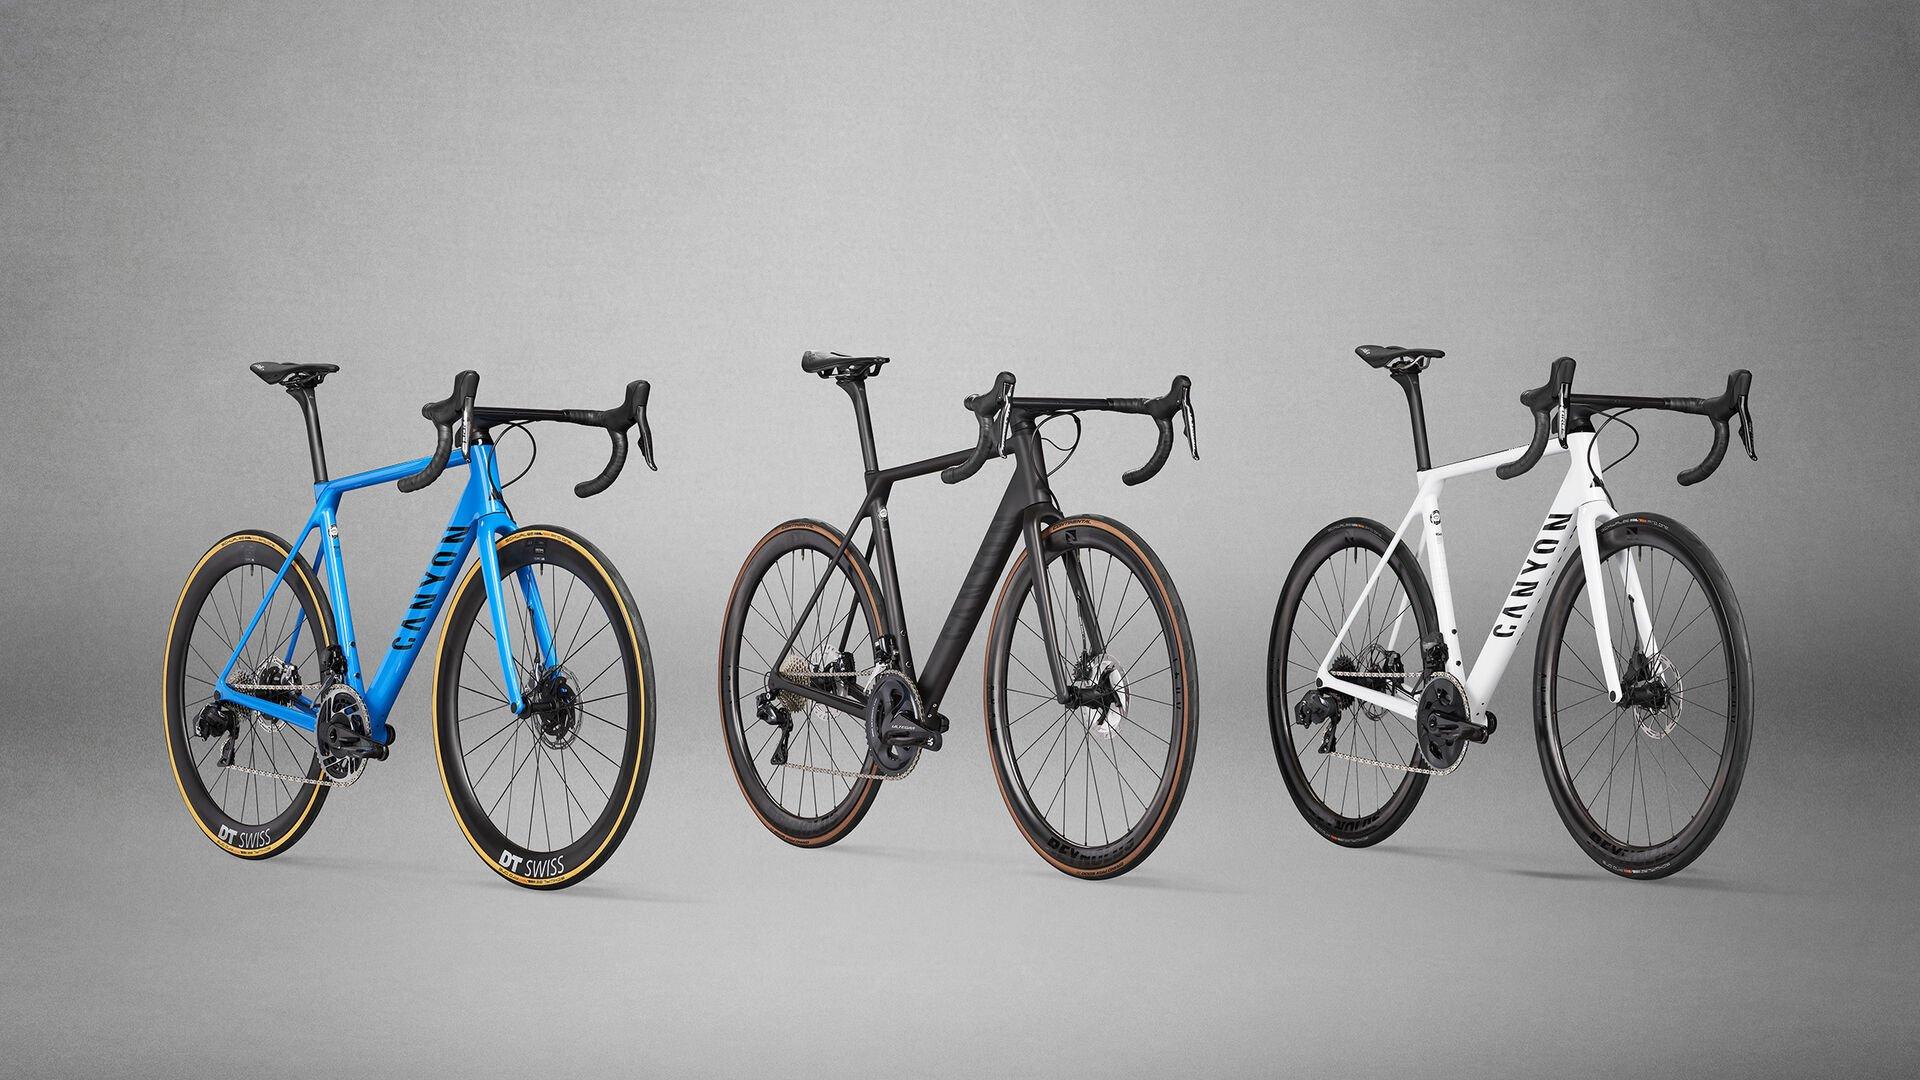 Canyon Ultimate race bikes